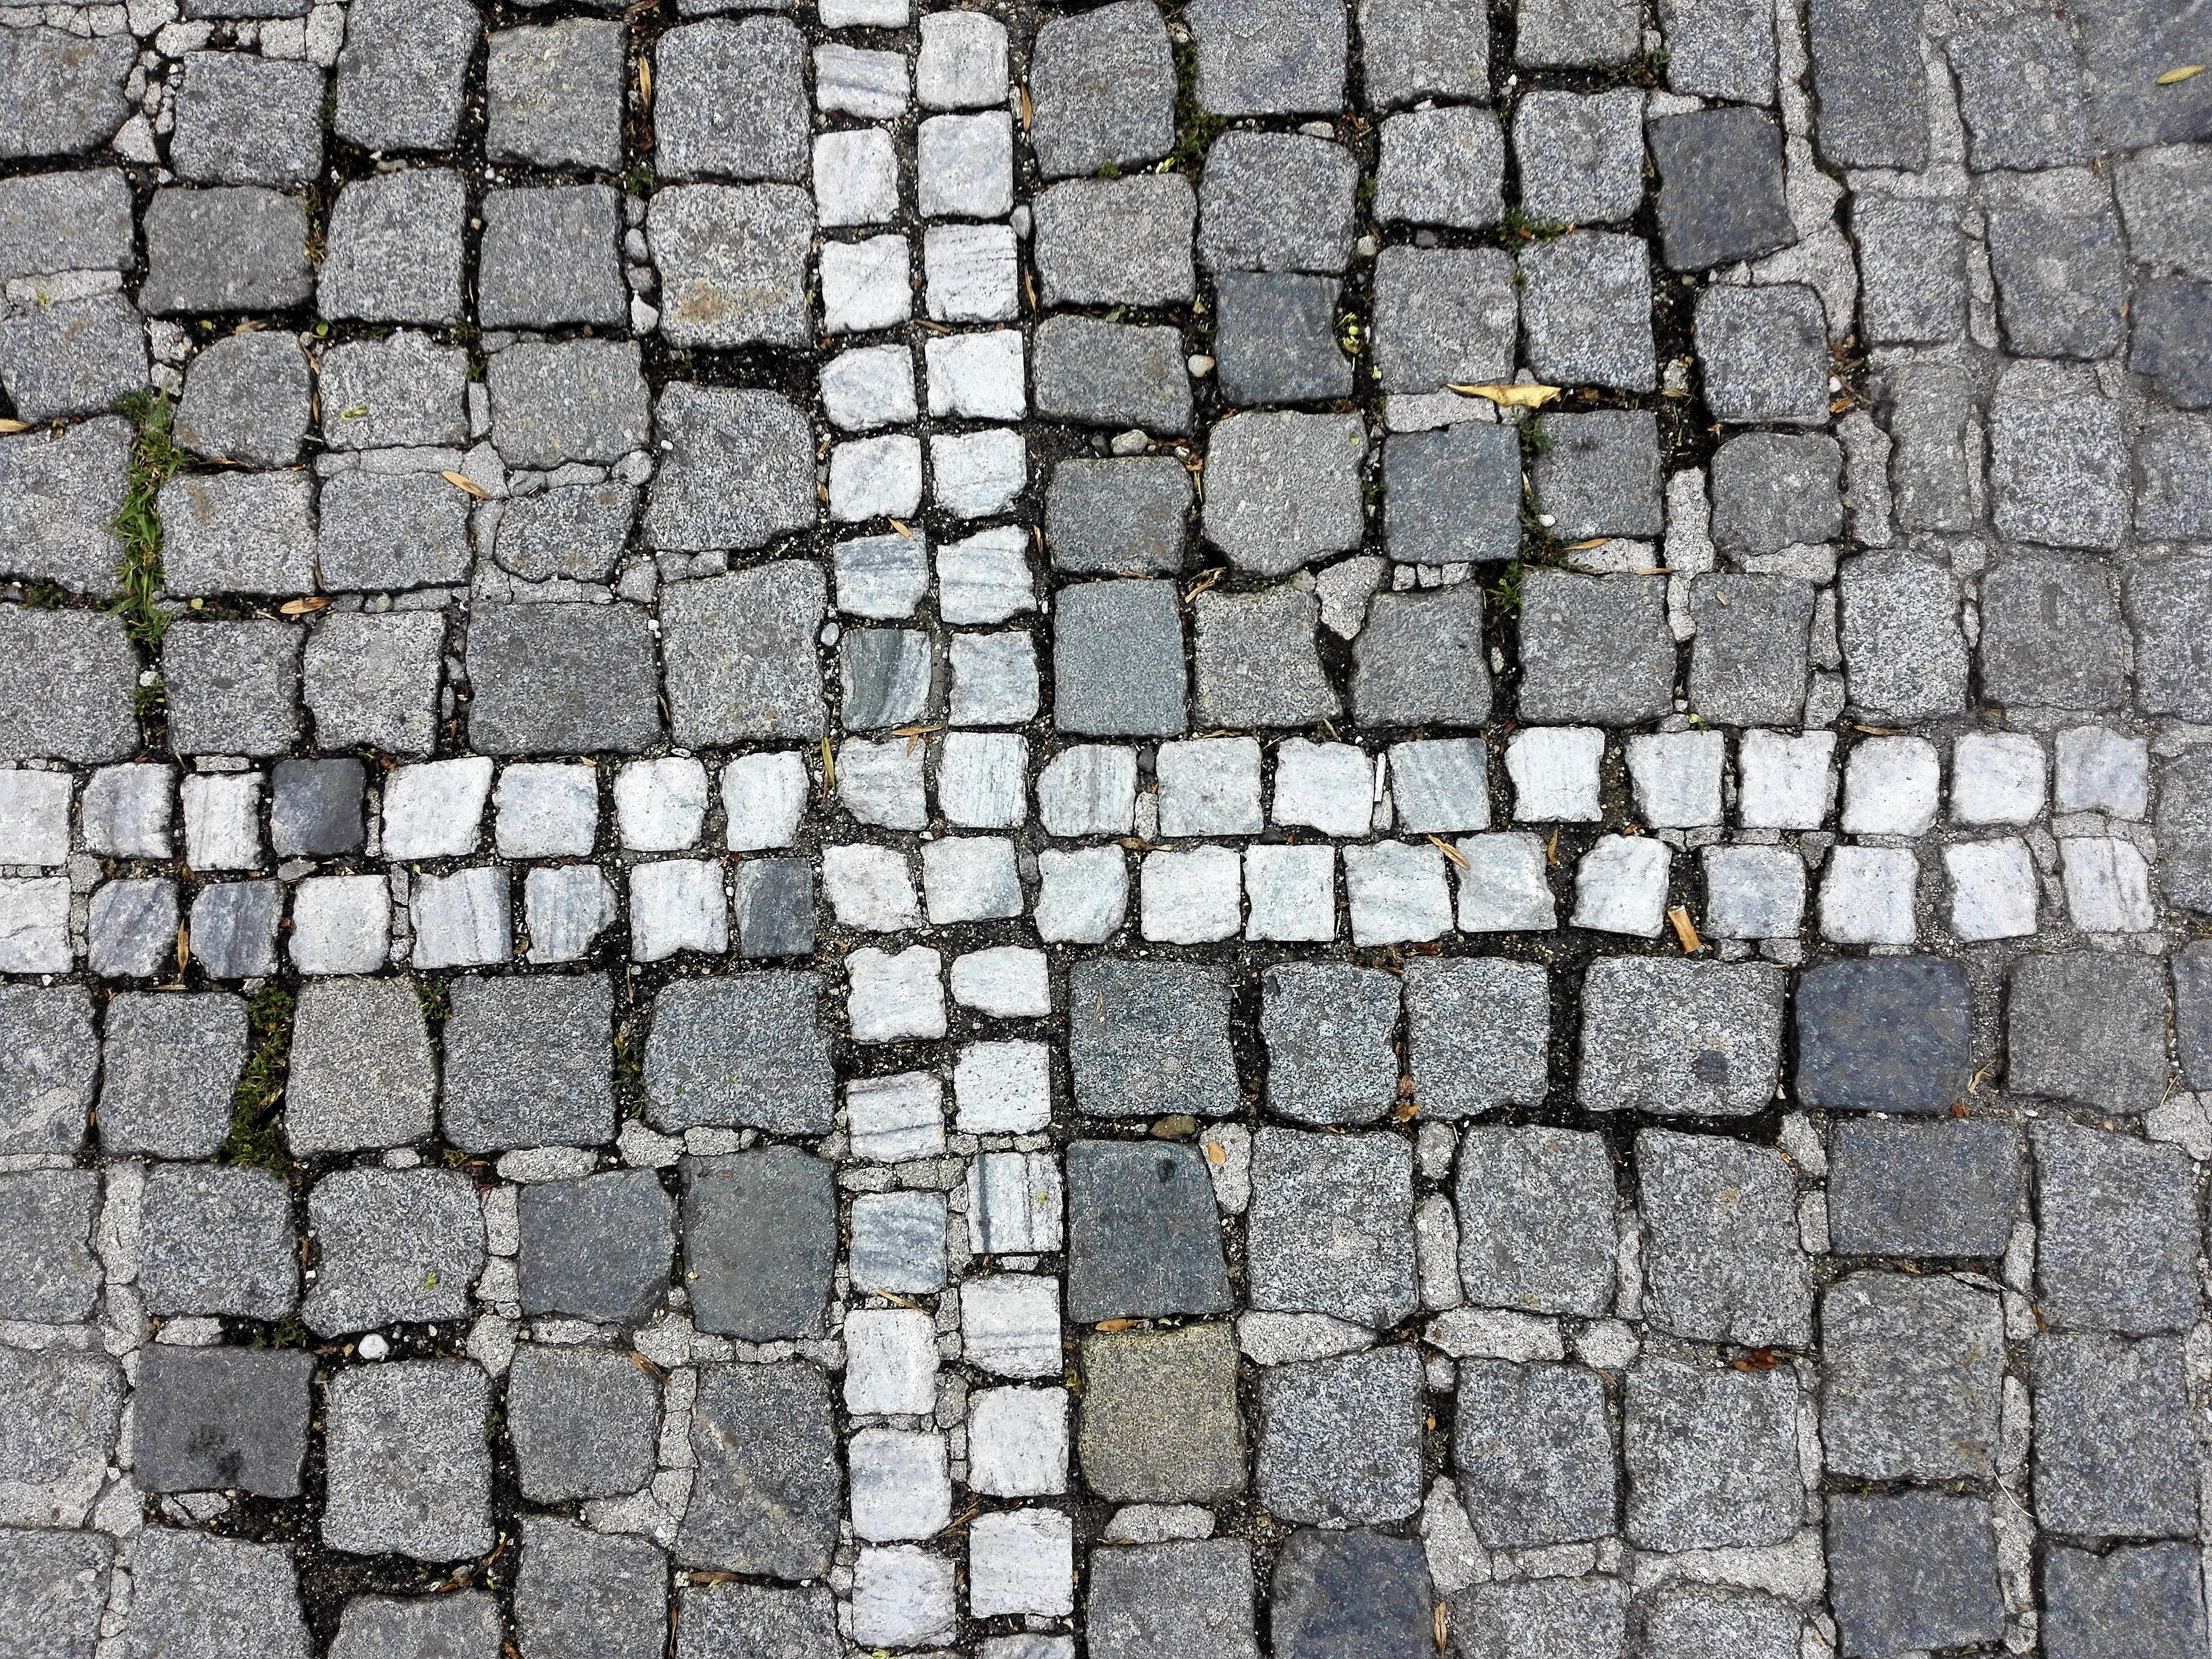 fotos gratis rock estructura suelo textura piso guijarro pared asfalto pavimento patrn pared de piedra cruzar cristiano ladrillo material